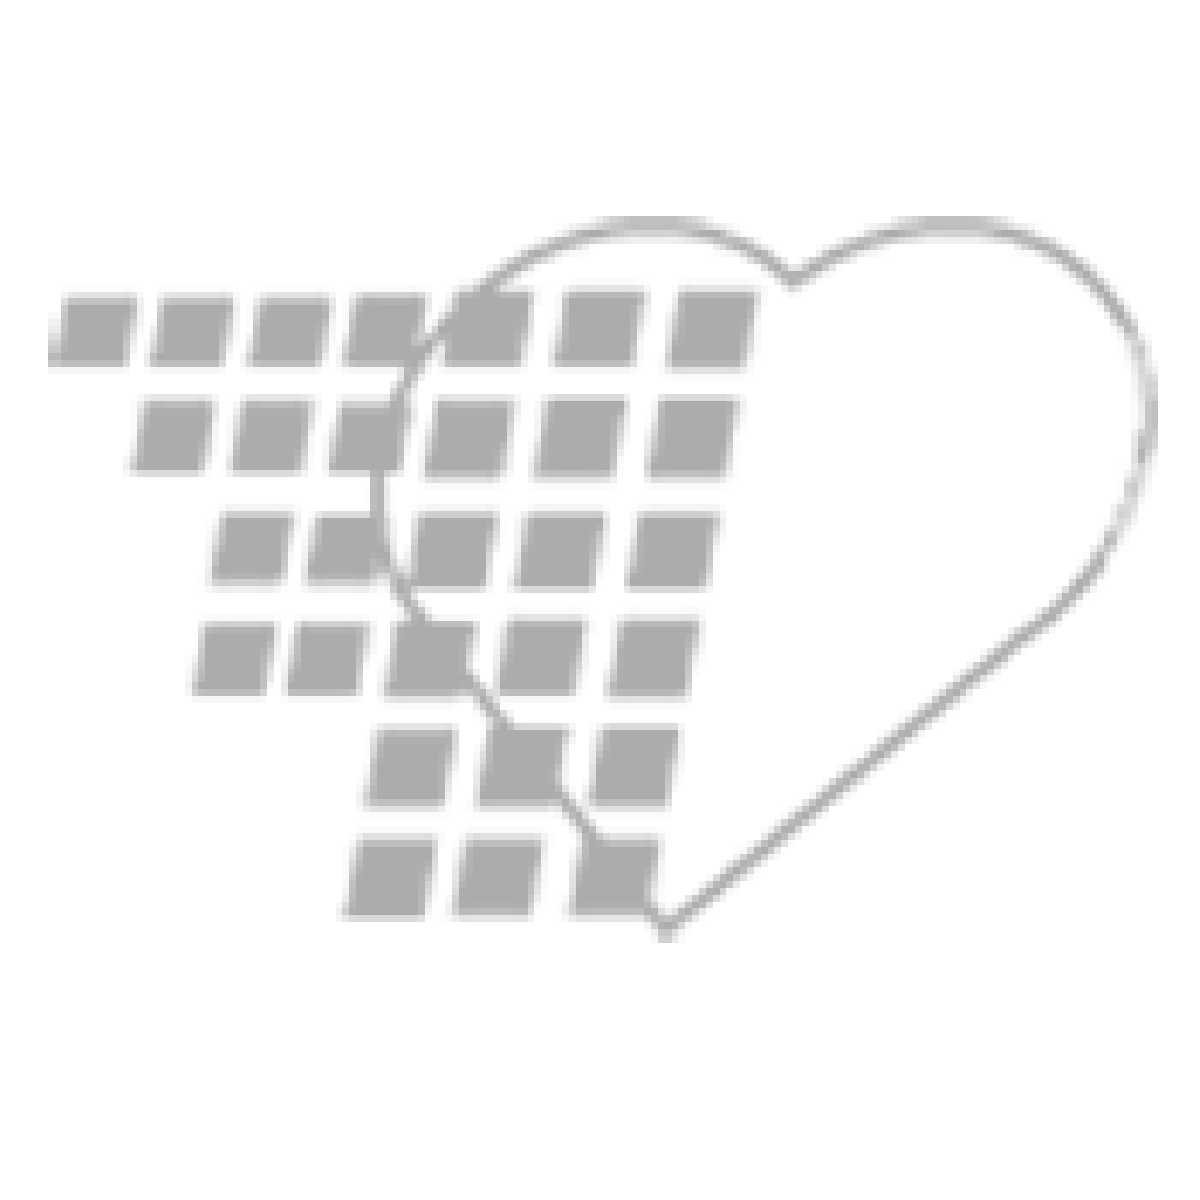 11-81-0947 Life/form® Pitting Edema Trainer